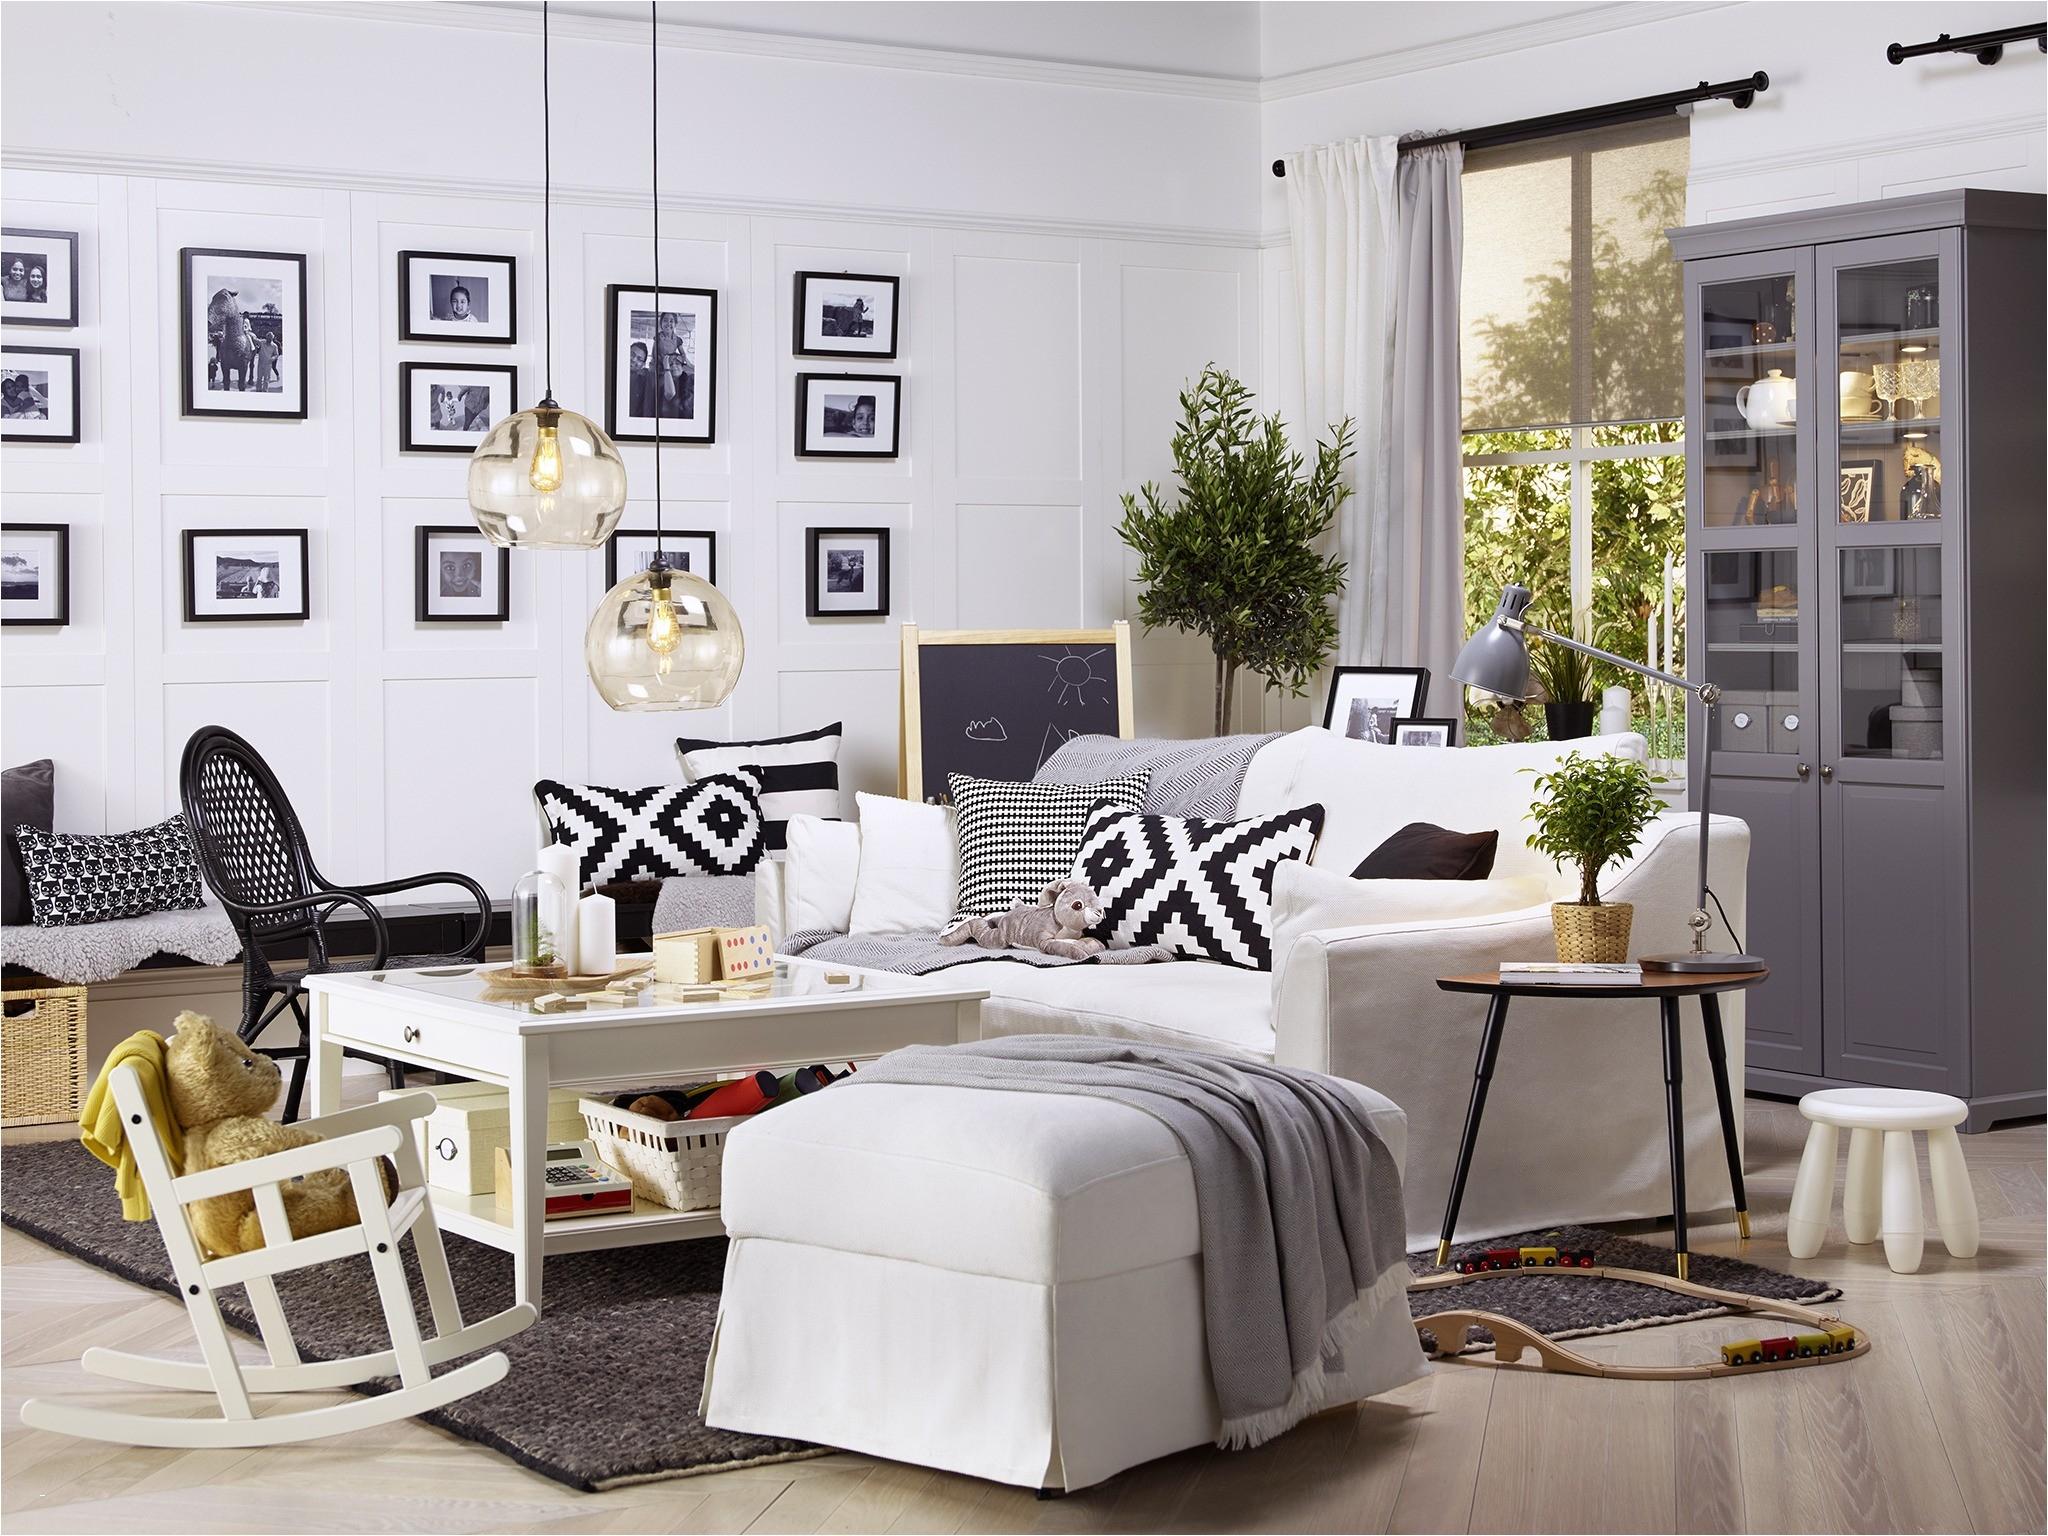 bedroom furniture sets ikea elegant living room furniture ideas ikea ireland dublin with astounding